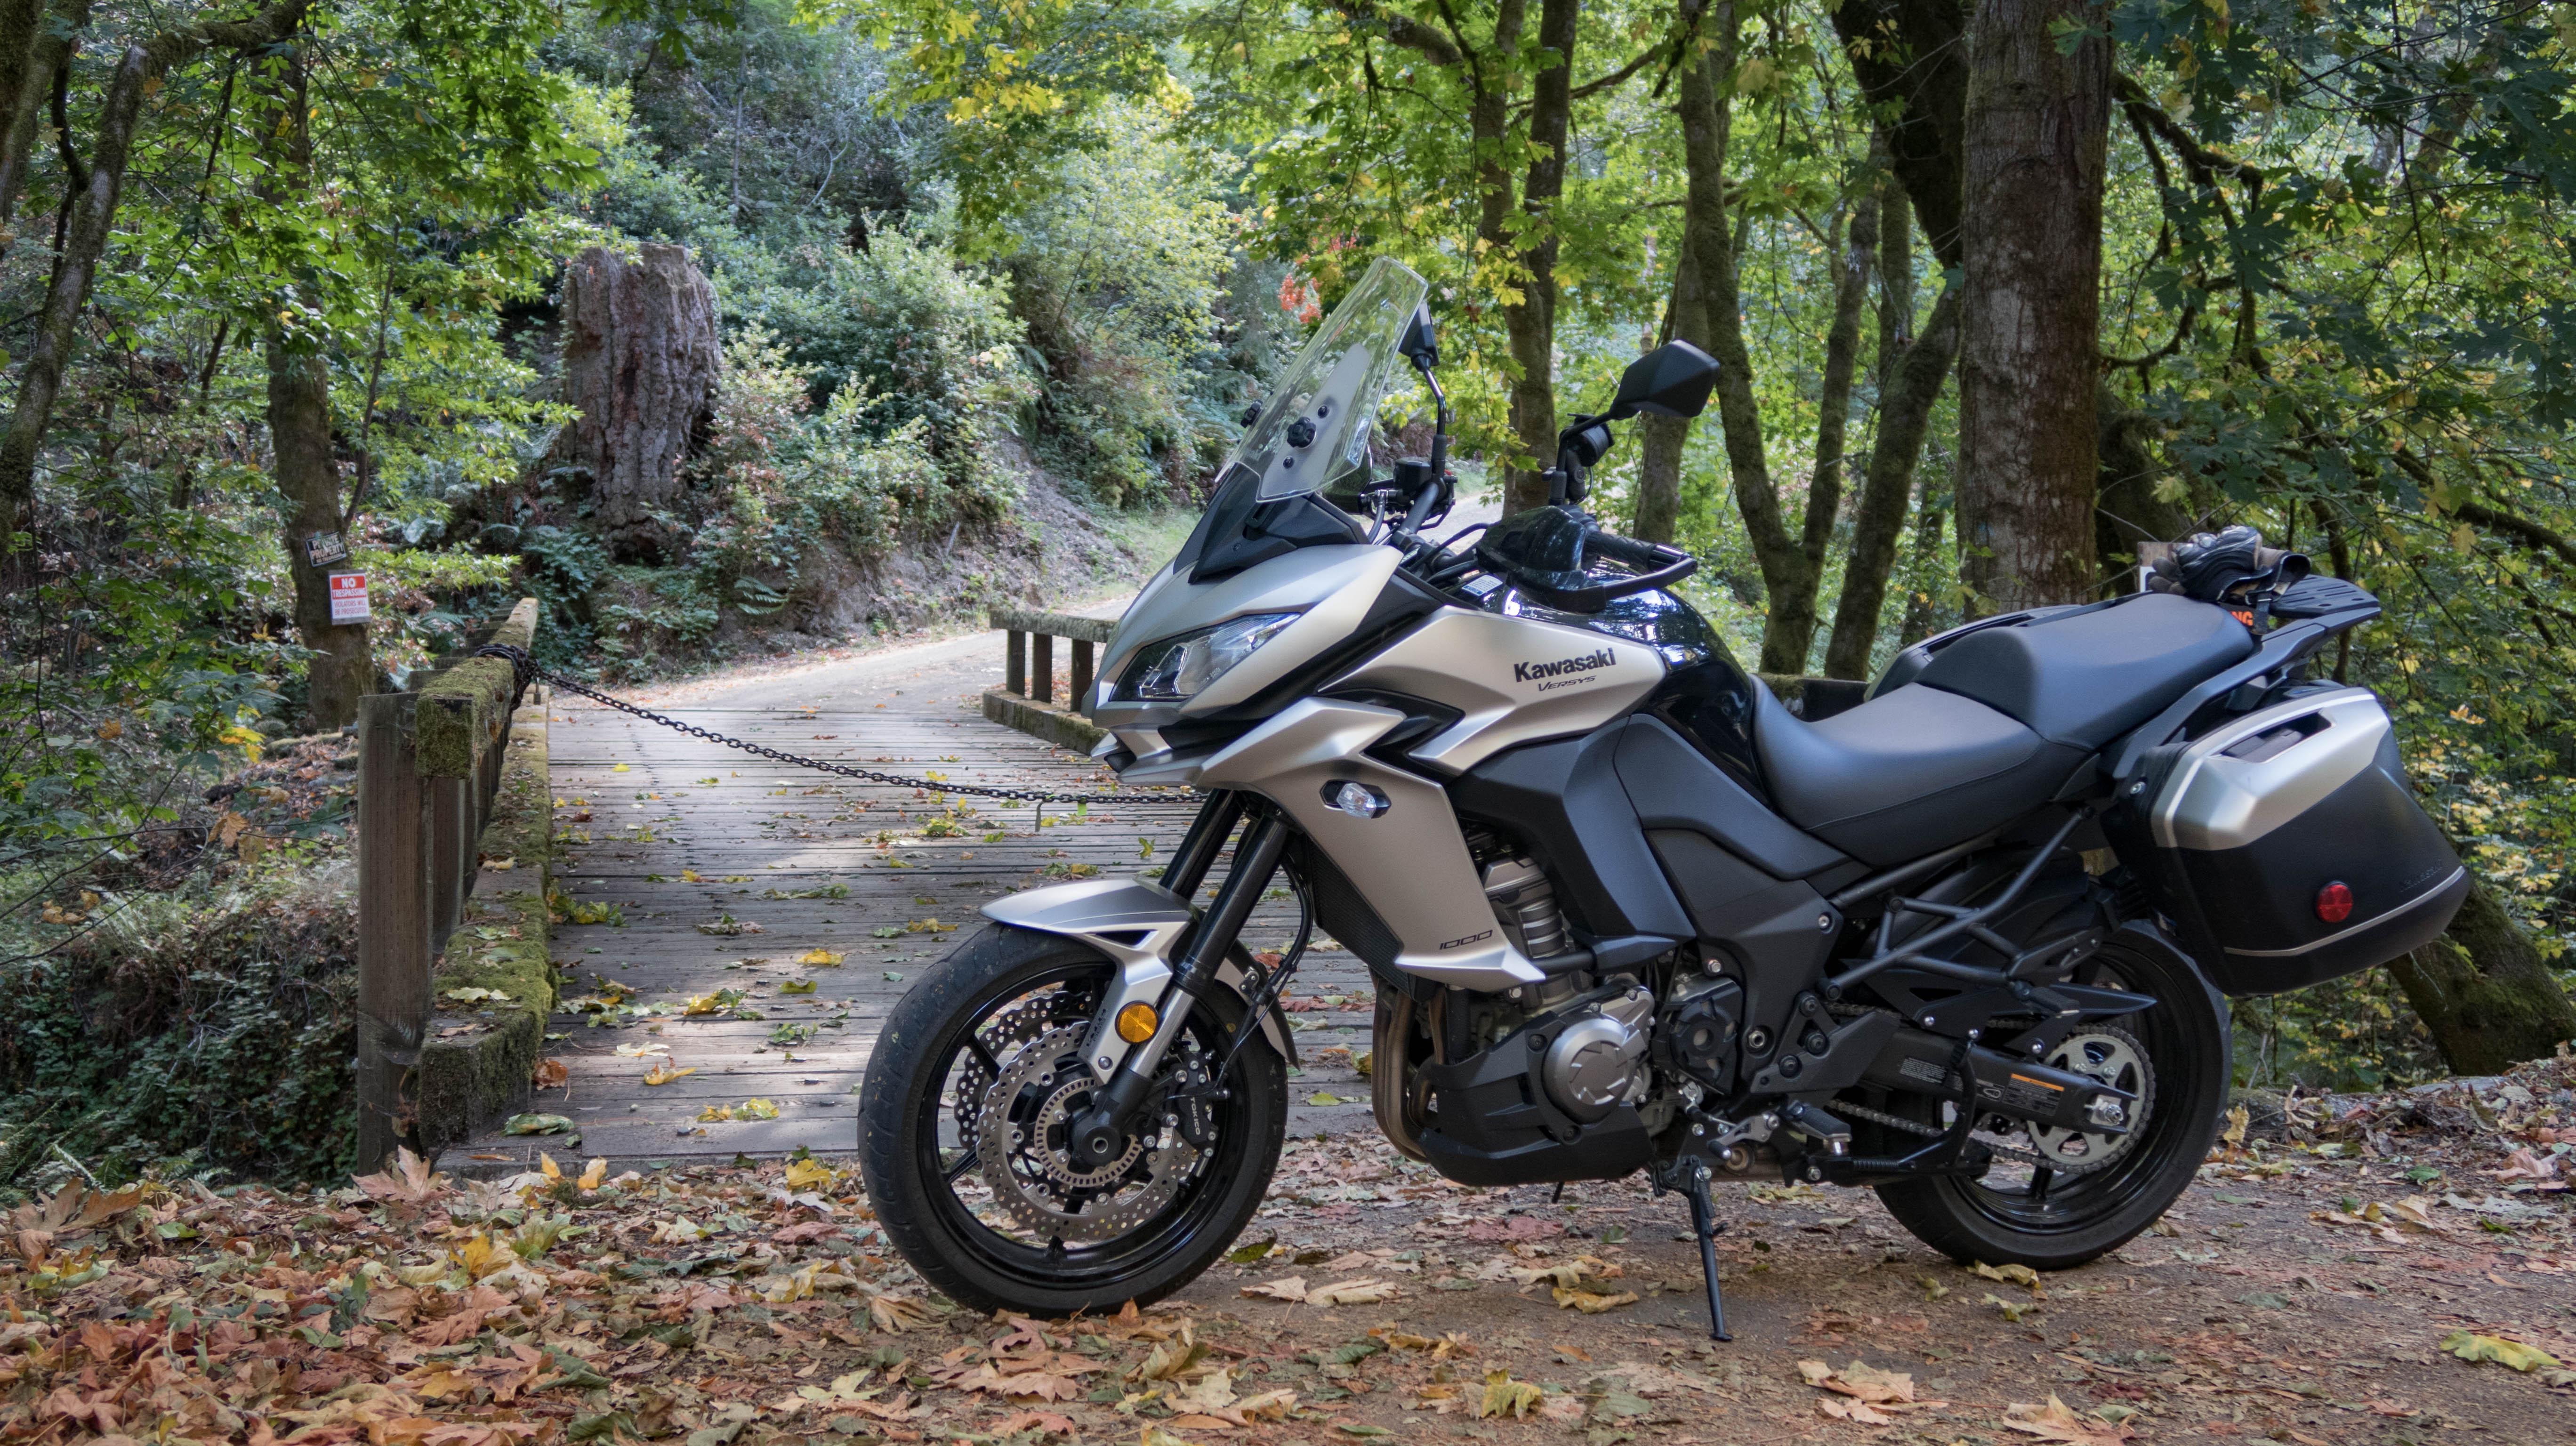 Kawasaki Versys 1000 LT: Purisma State Park